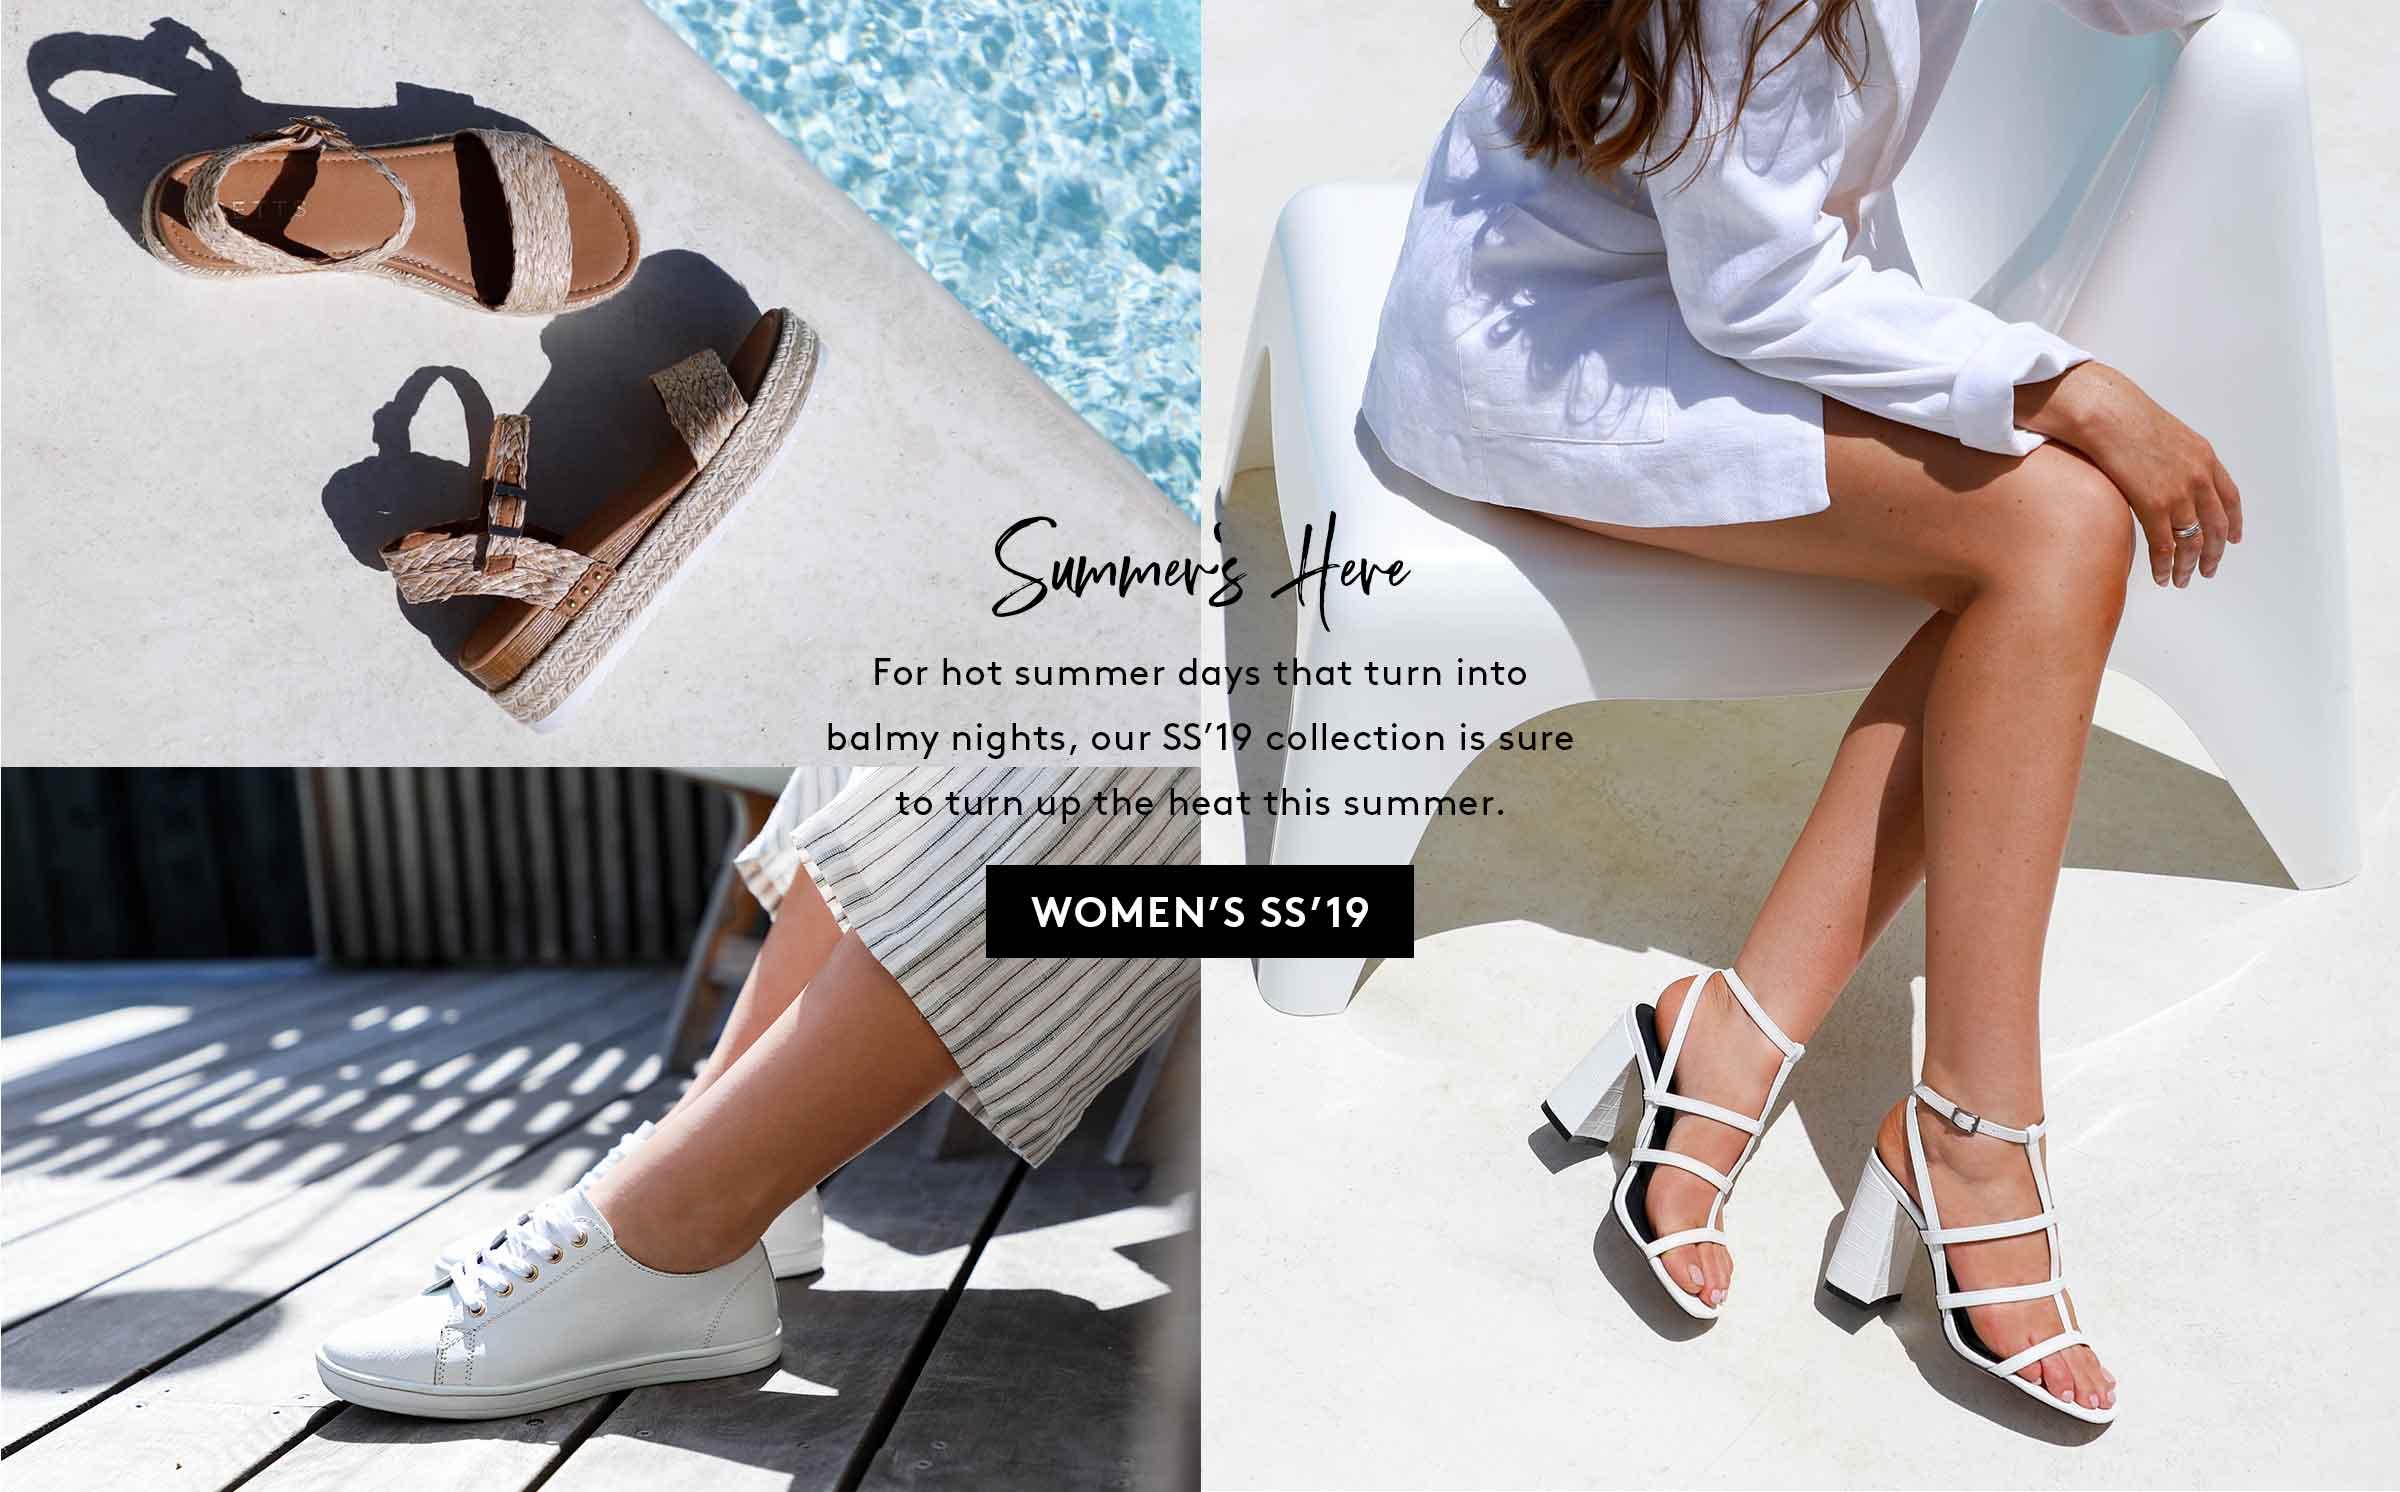 Buy Men's & Women's Shoes Online | Australia's Leading Shoe